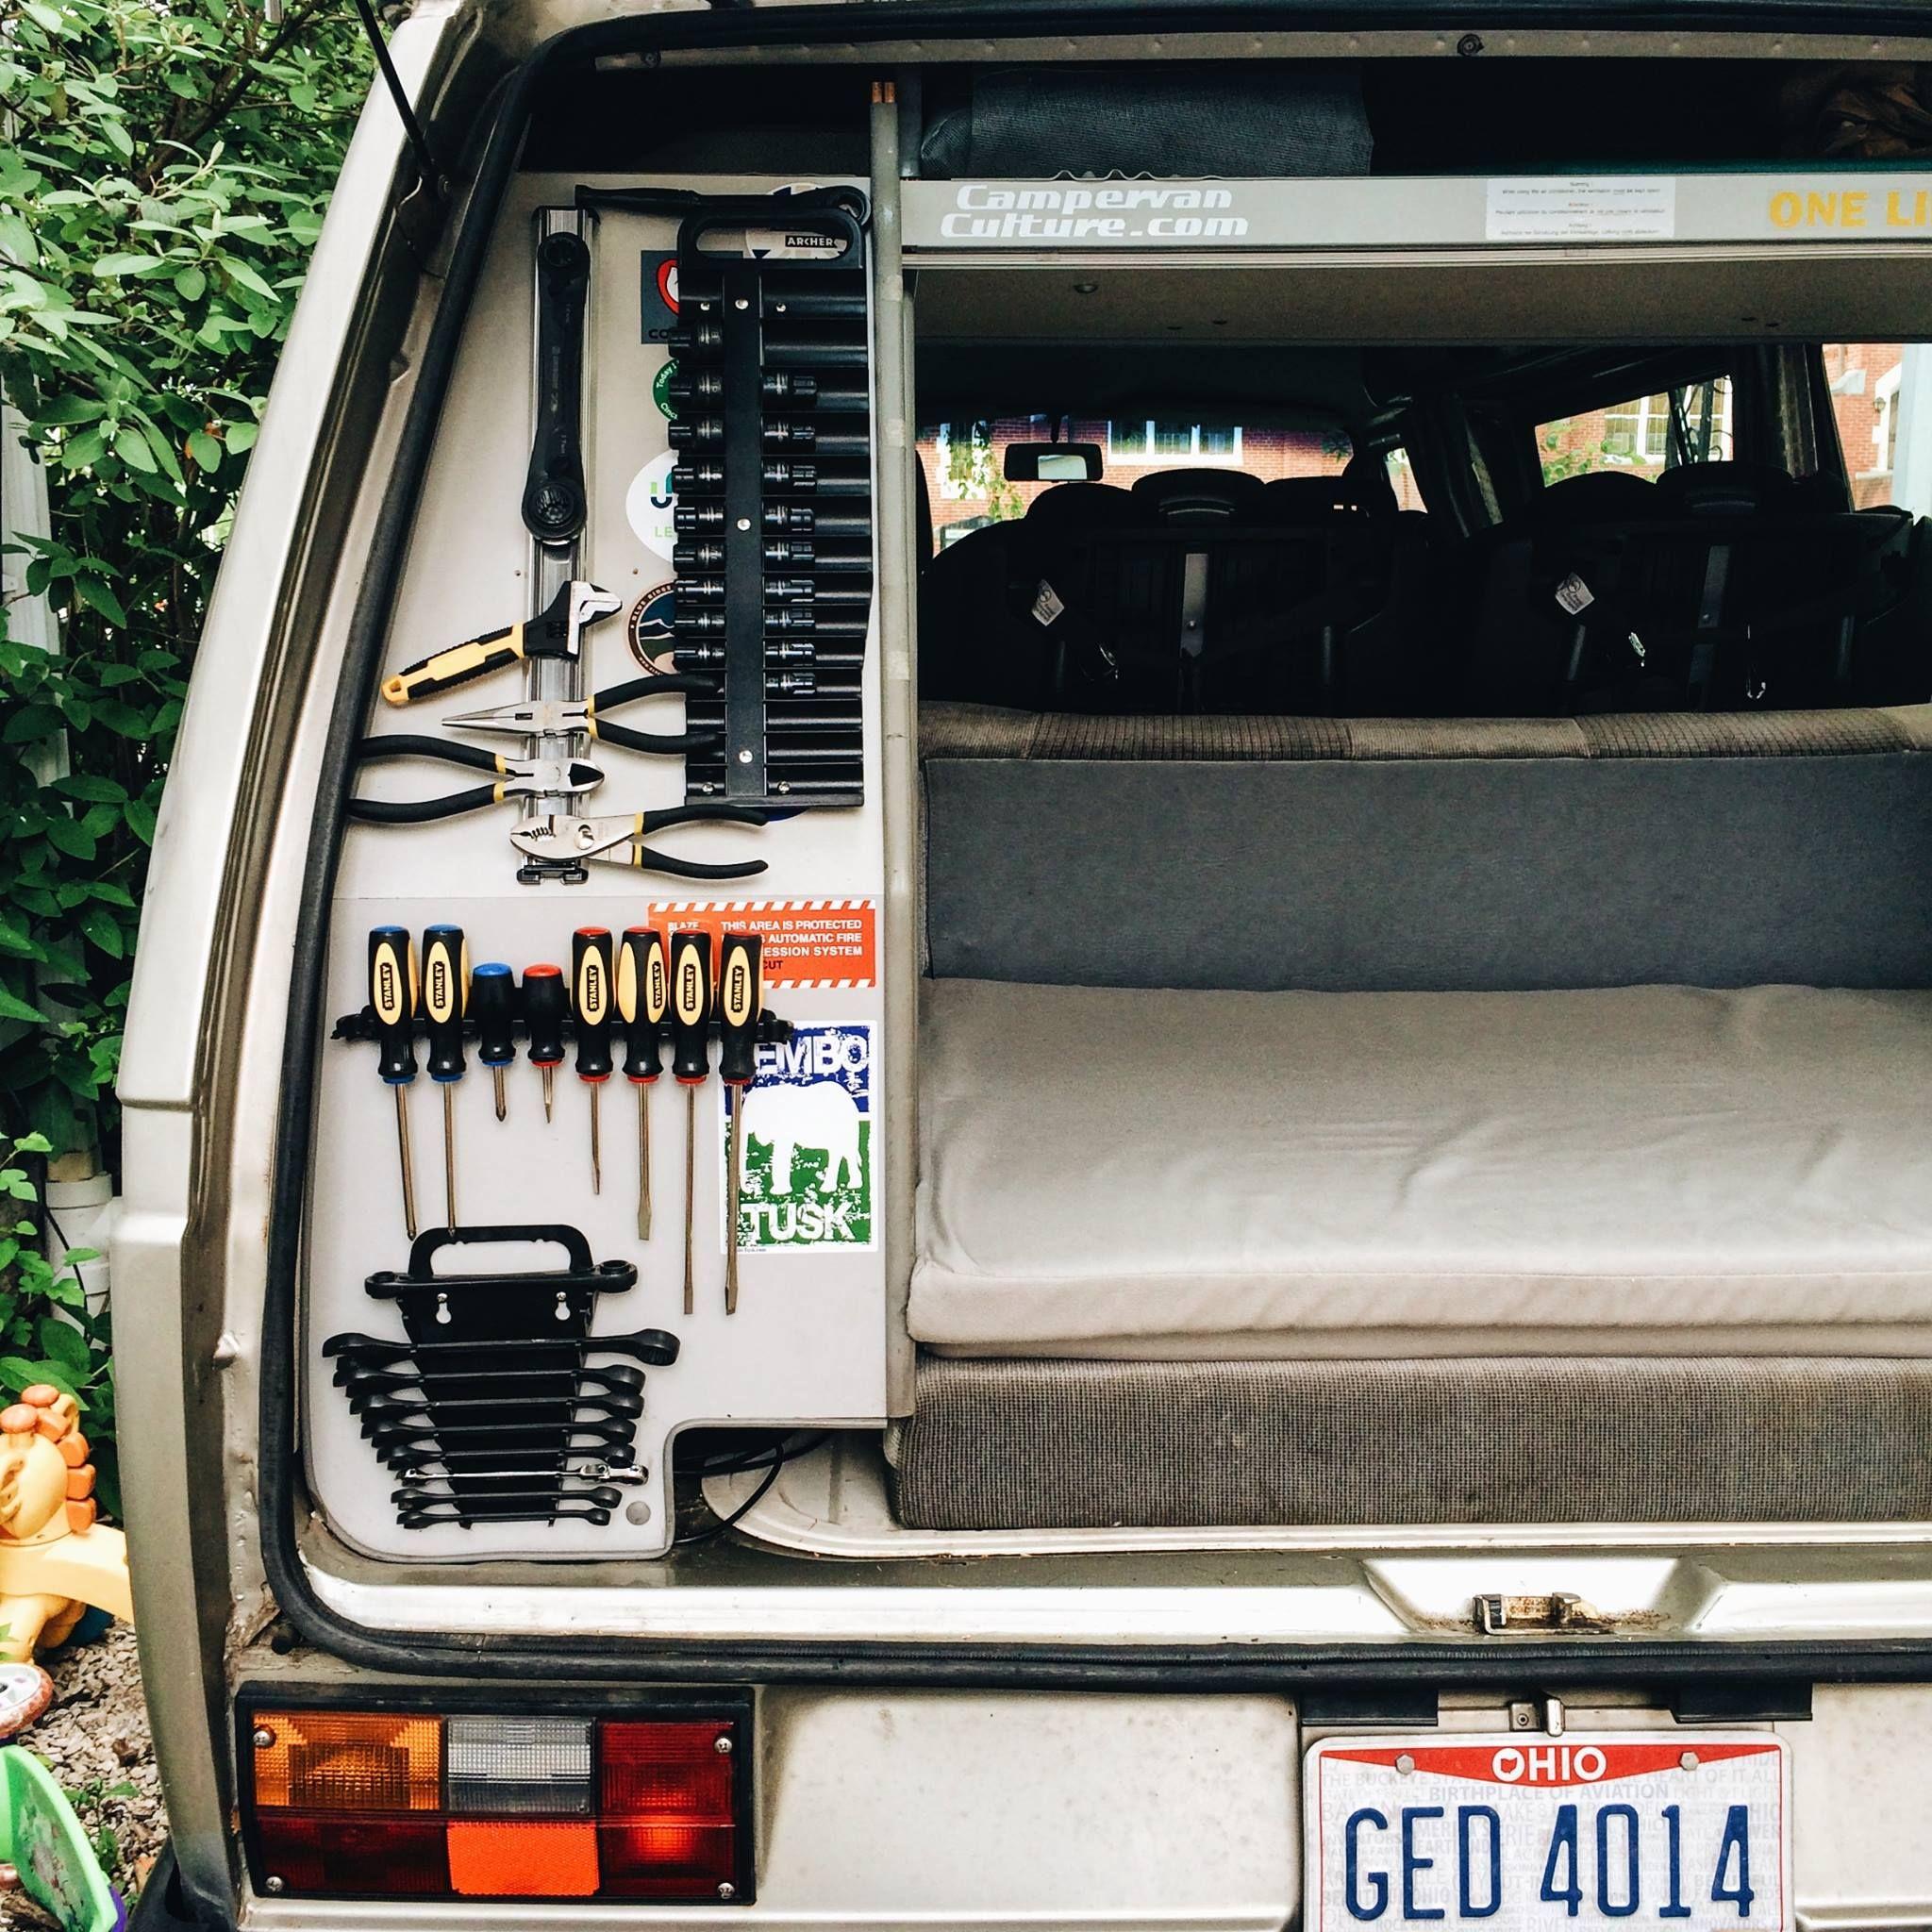 Volkswagen bus vanagon take a look volkswagon new interior run and - Campervan Interior